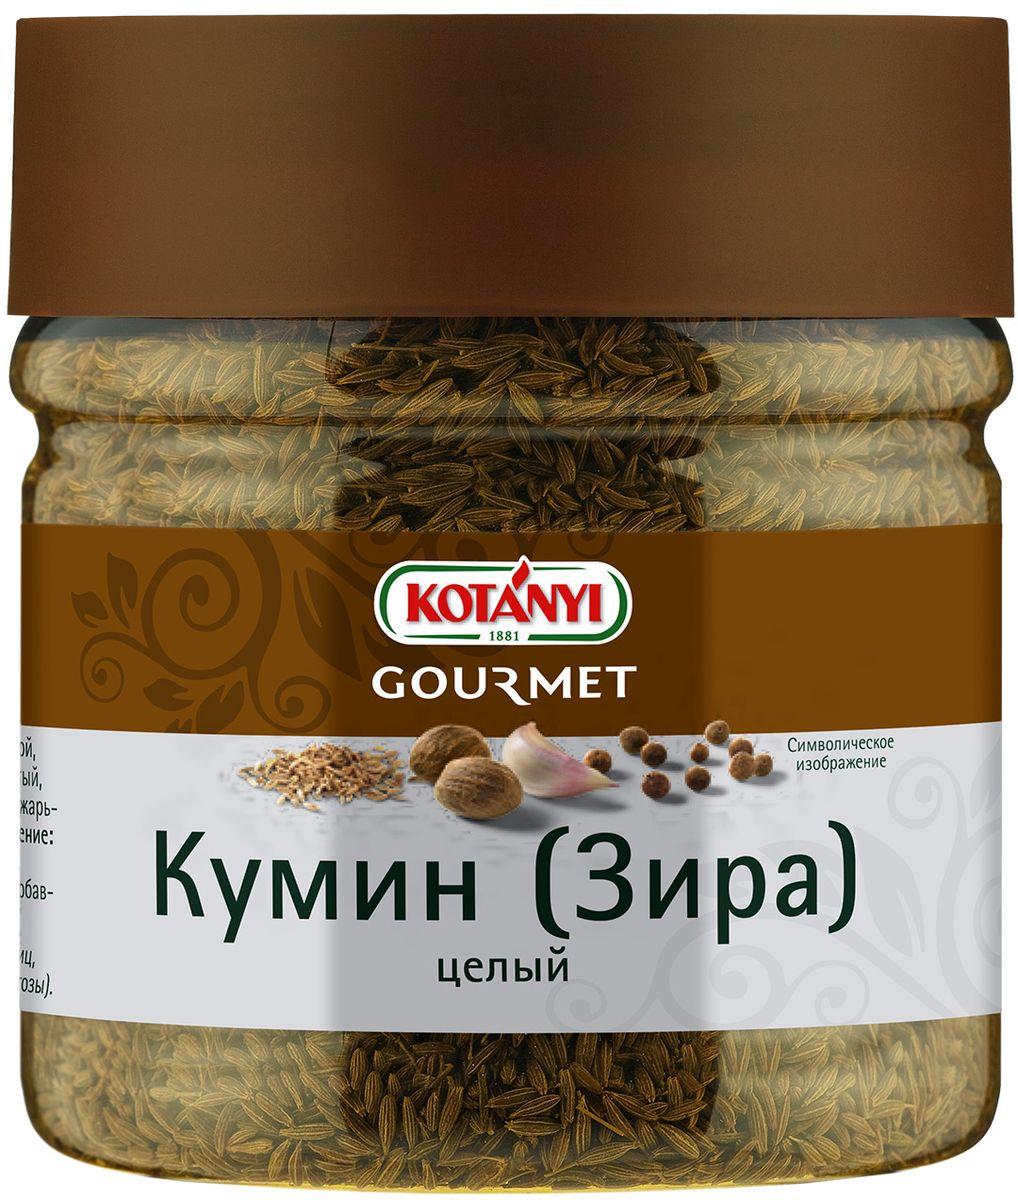 Kotanyi Кумин (зира) целый, 140 г